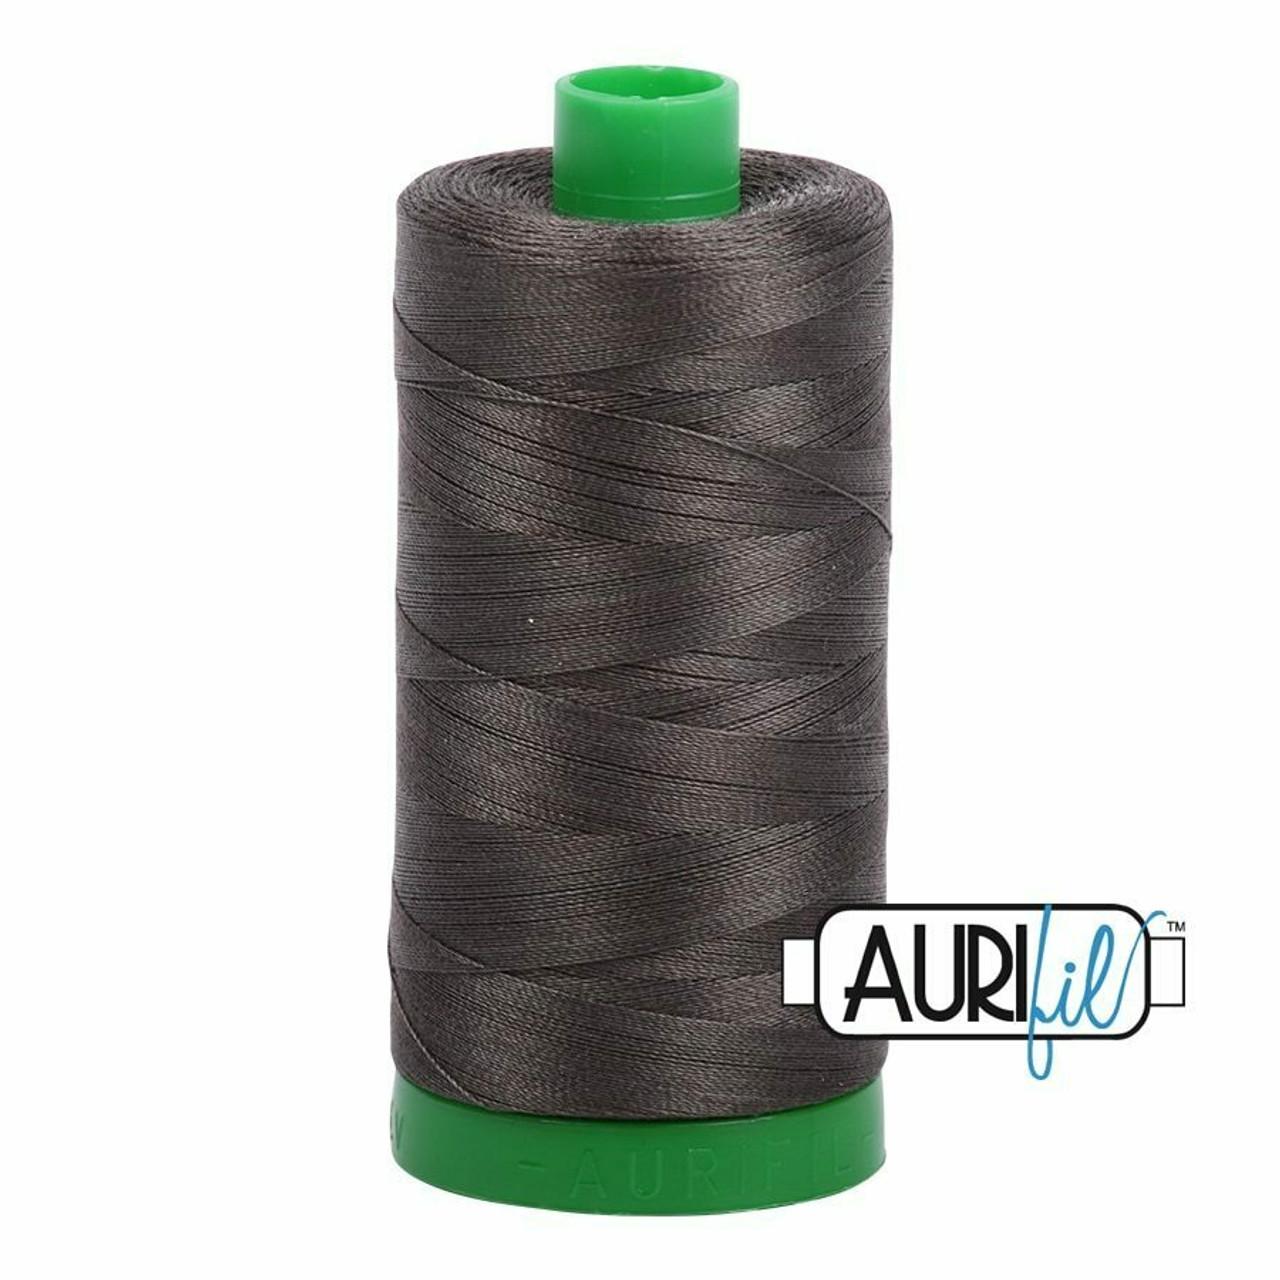 Aurifil 40wt Asphalt (5013) thread